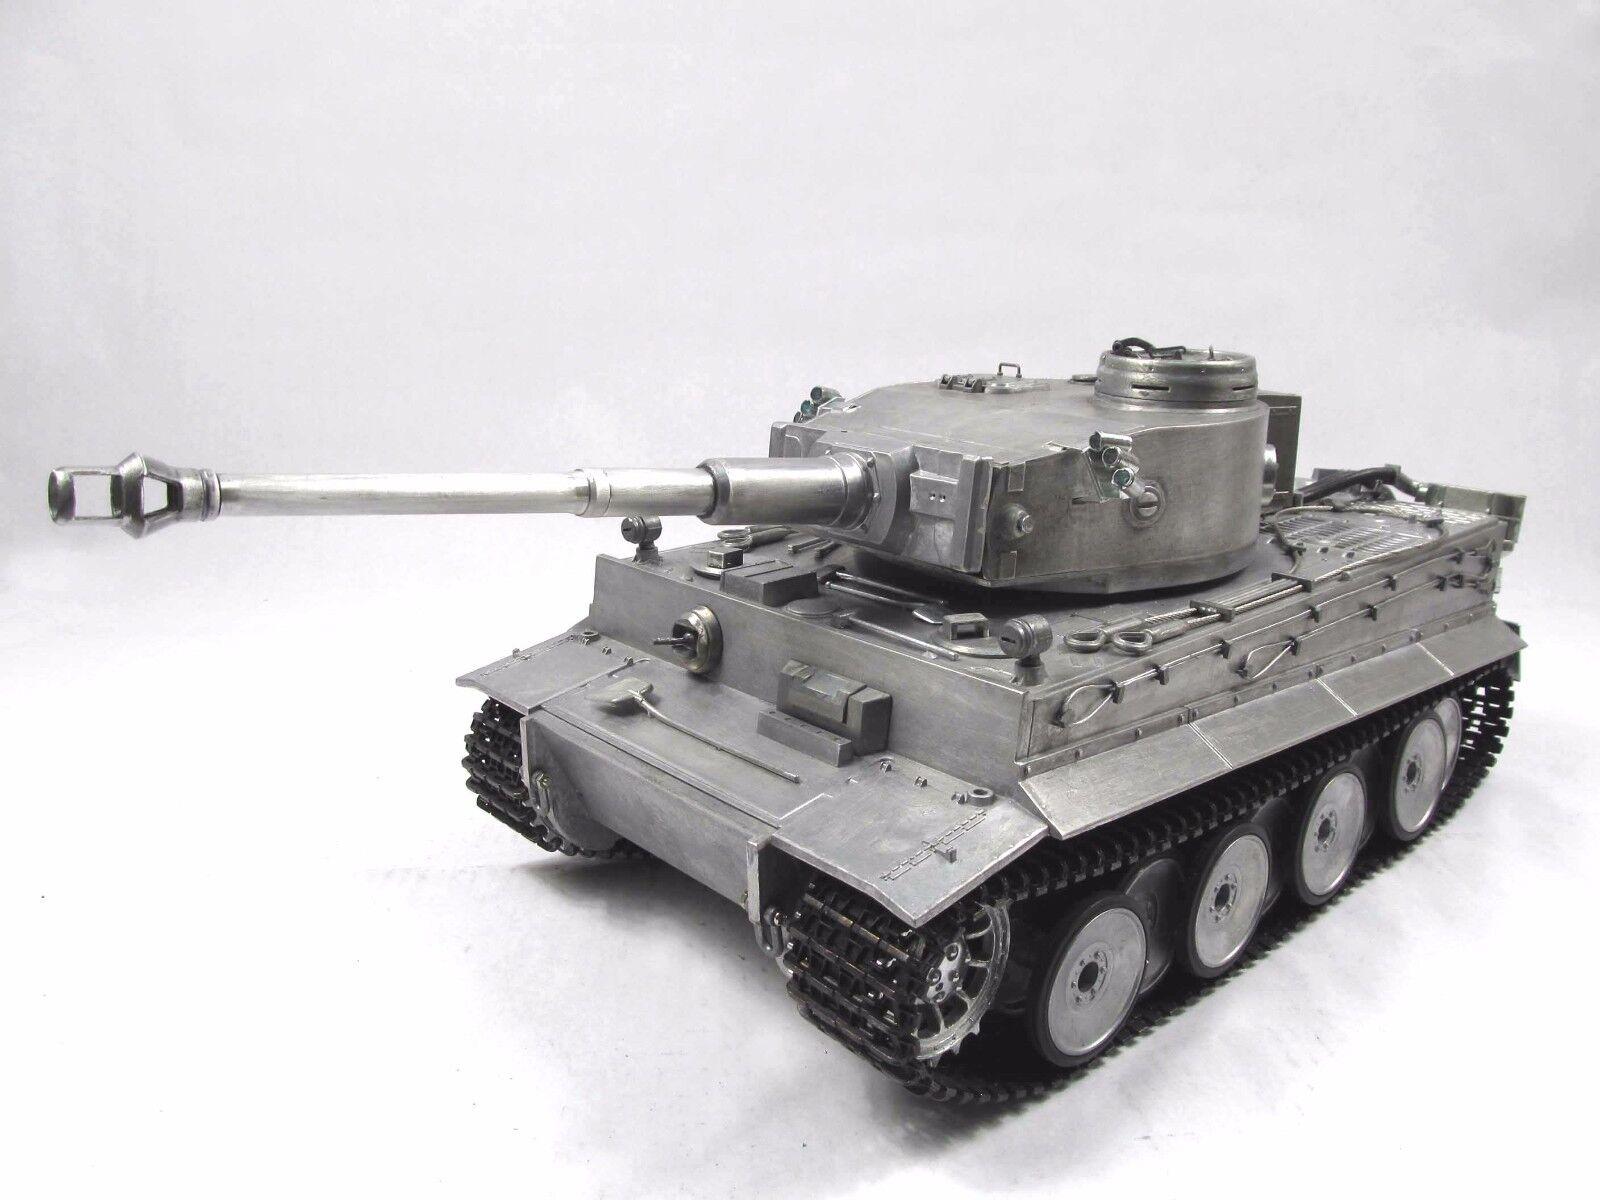 Complete Metal 1 16 Mato Tiger I KIT Version BB Pellet RC Tank Metal color 1220